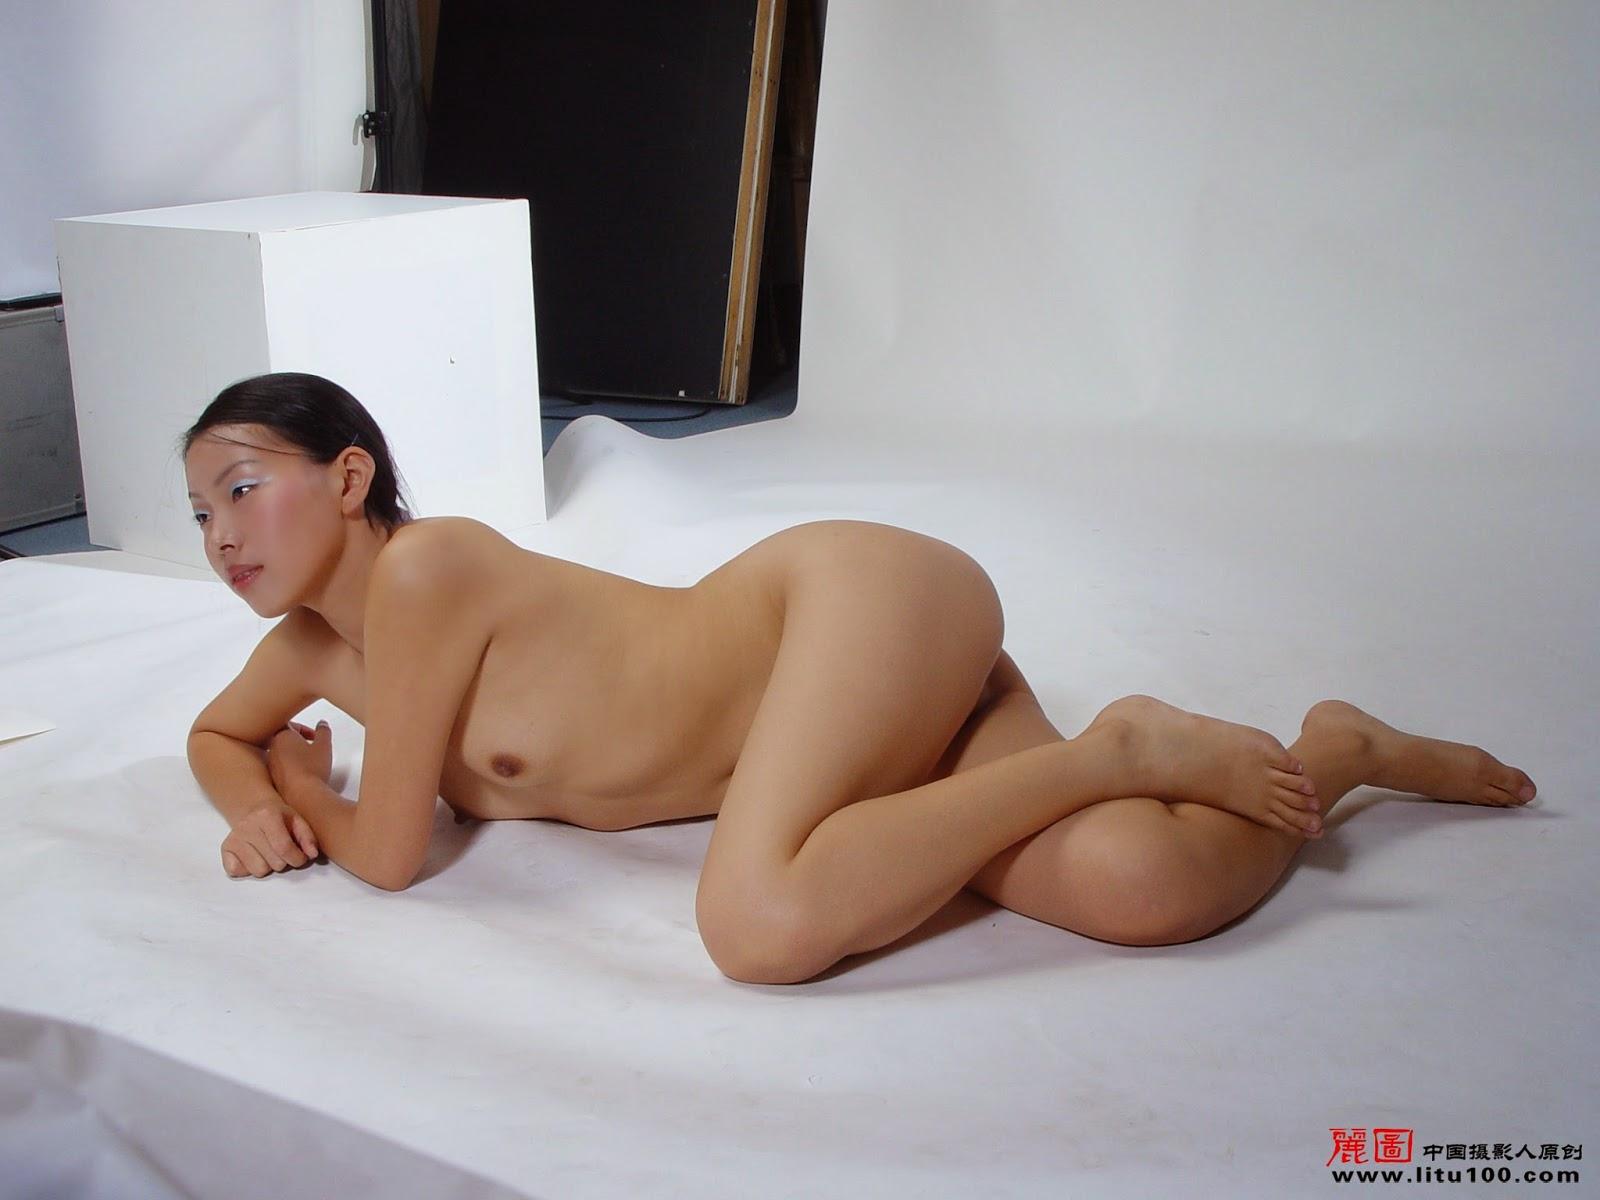 Hot girl masterbates psp